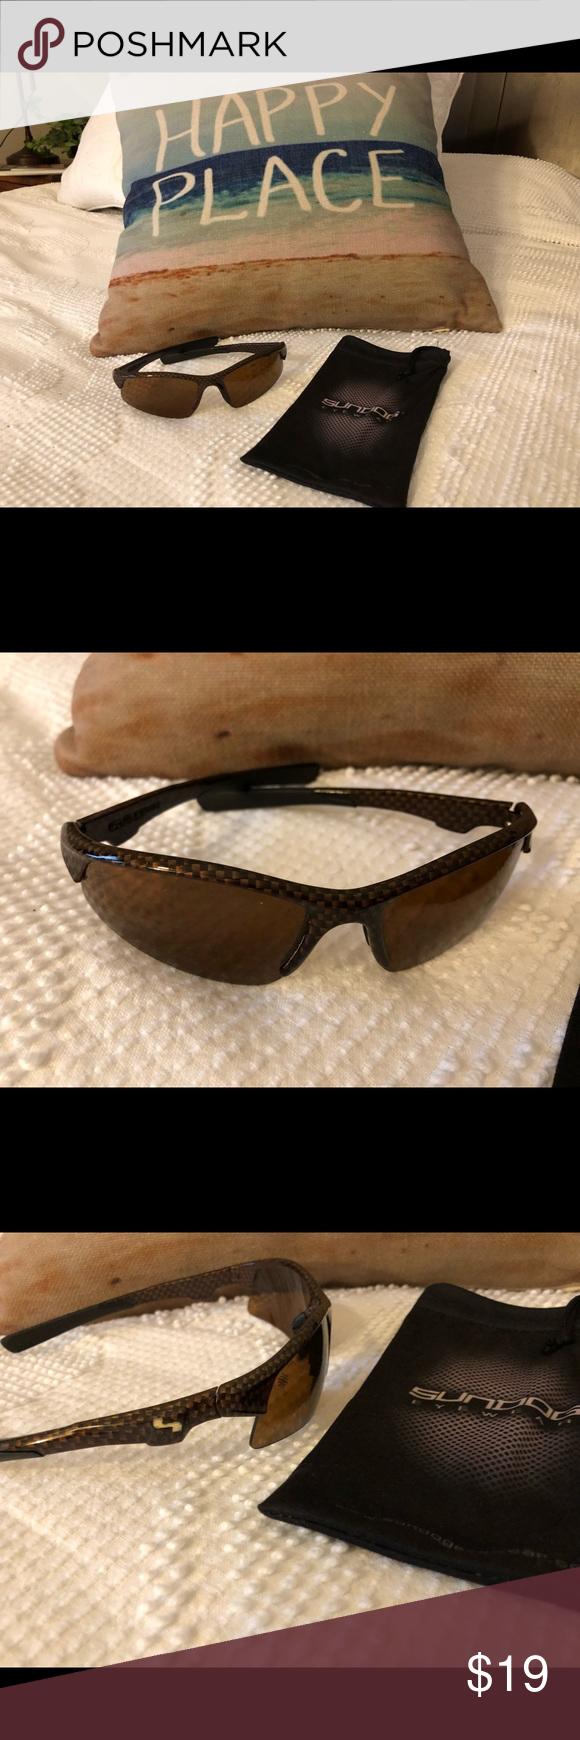 51096f40864 Sundog sunglasses Sundog sunglasses with case sold in most golf shops.  Sundog Accessories Sunglasses